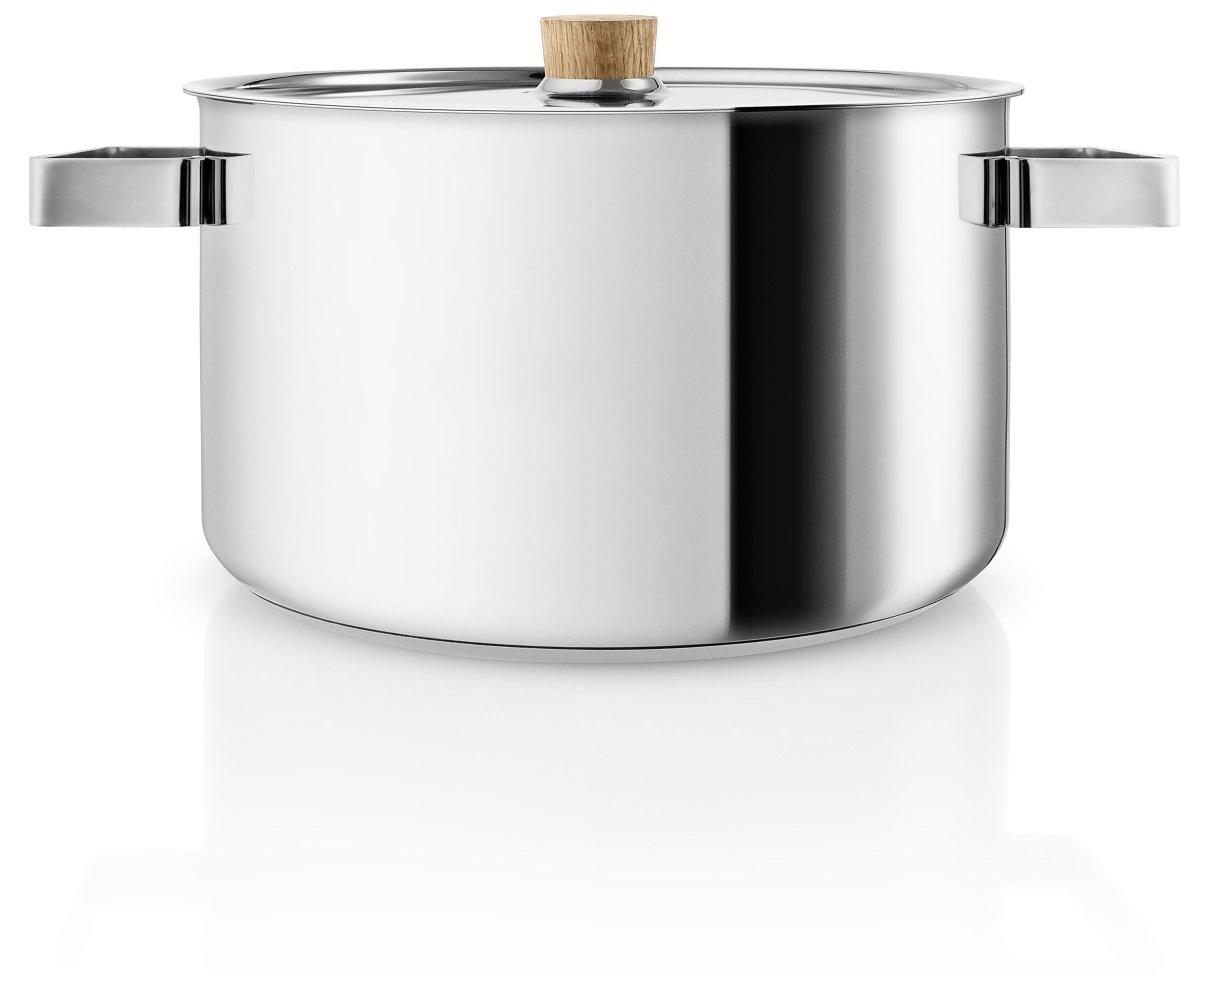 Eva Solo Nordic Kitchen Kookpan Ø 25.5 cm 6 liter